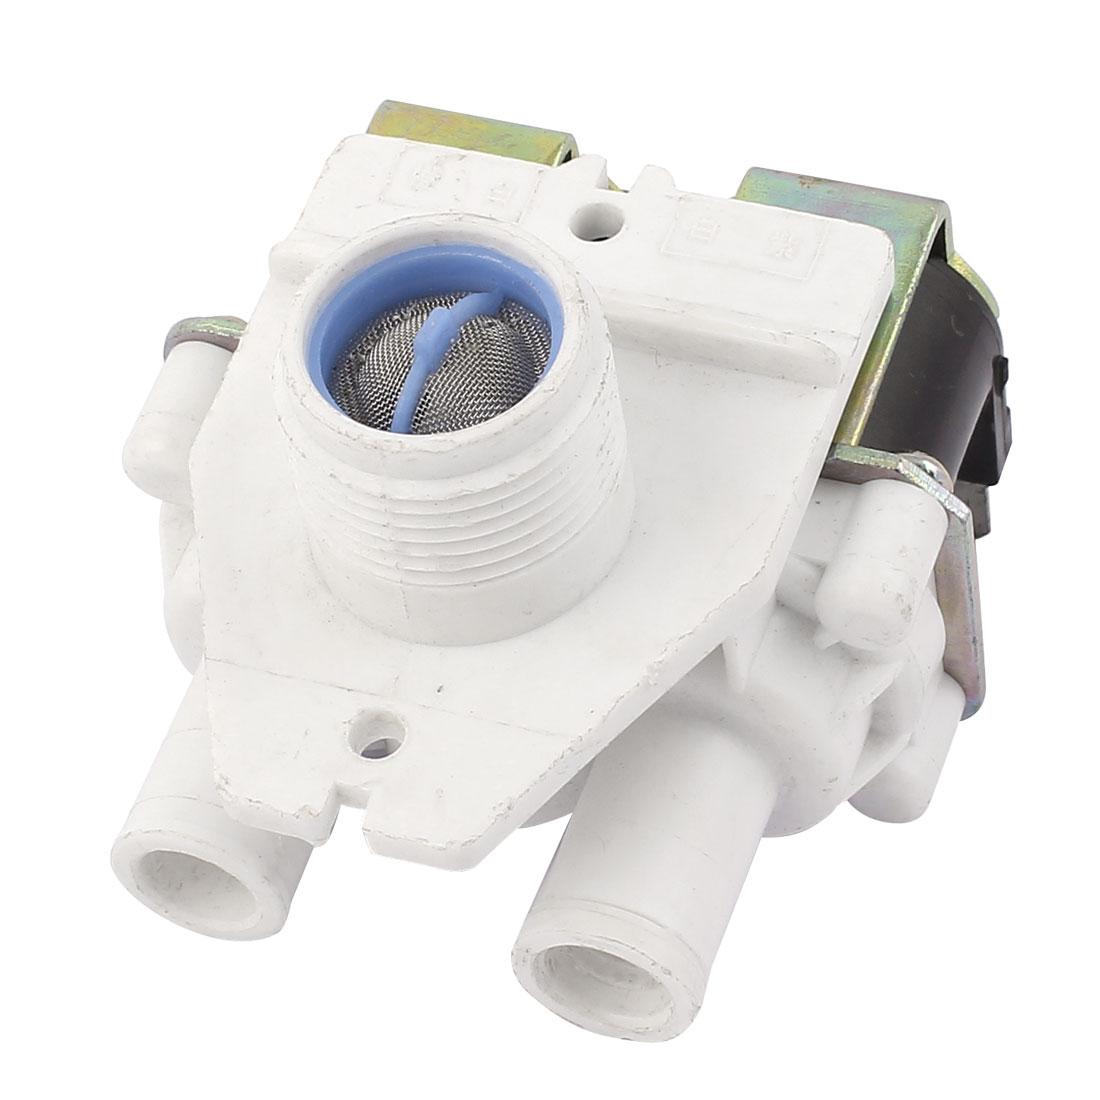 AC 220V-240V 50/60Hz 3/4 BSP Male Thread Water Inlet Solenoid Valve for Washing Machine